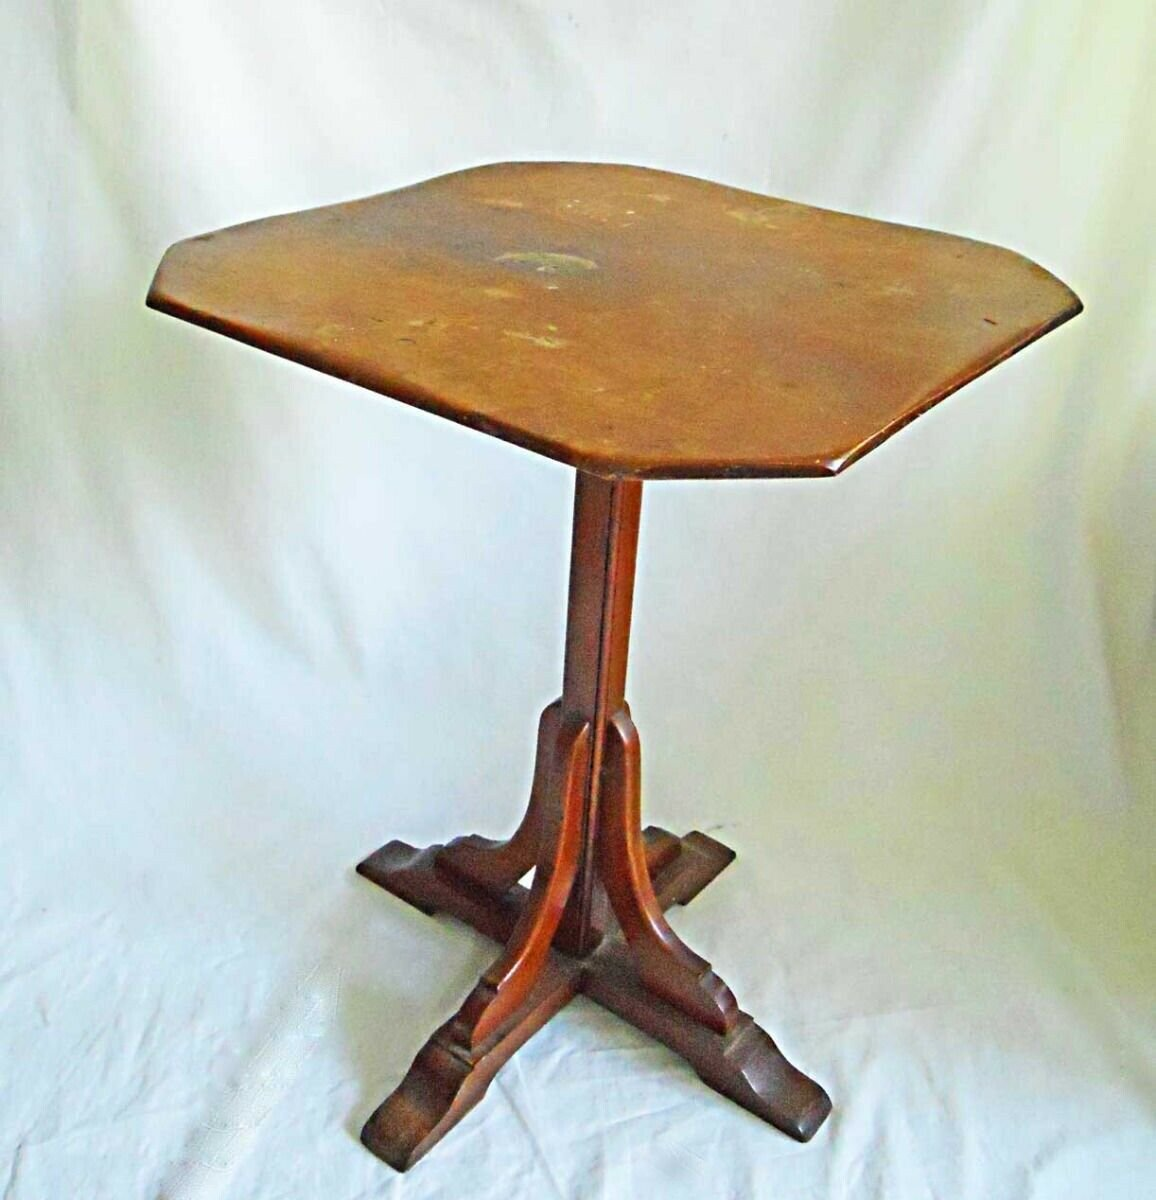 Vintage Antique Table Candlestand Hale Arlington Vermont Country Furniture